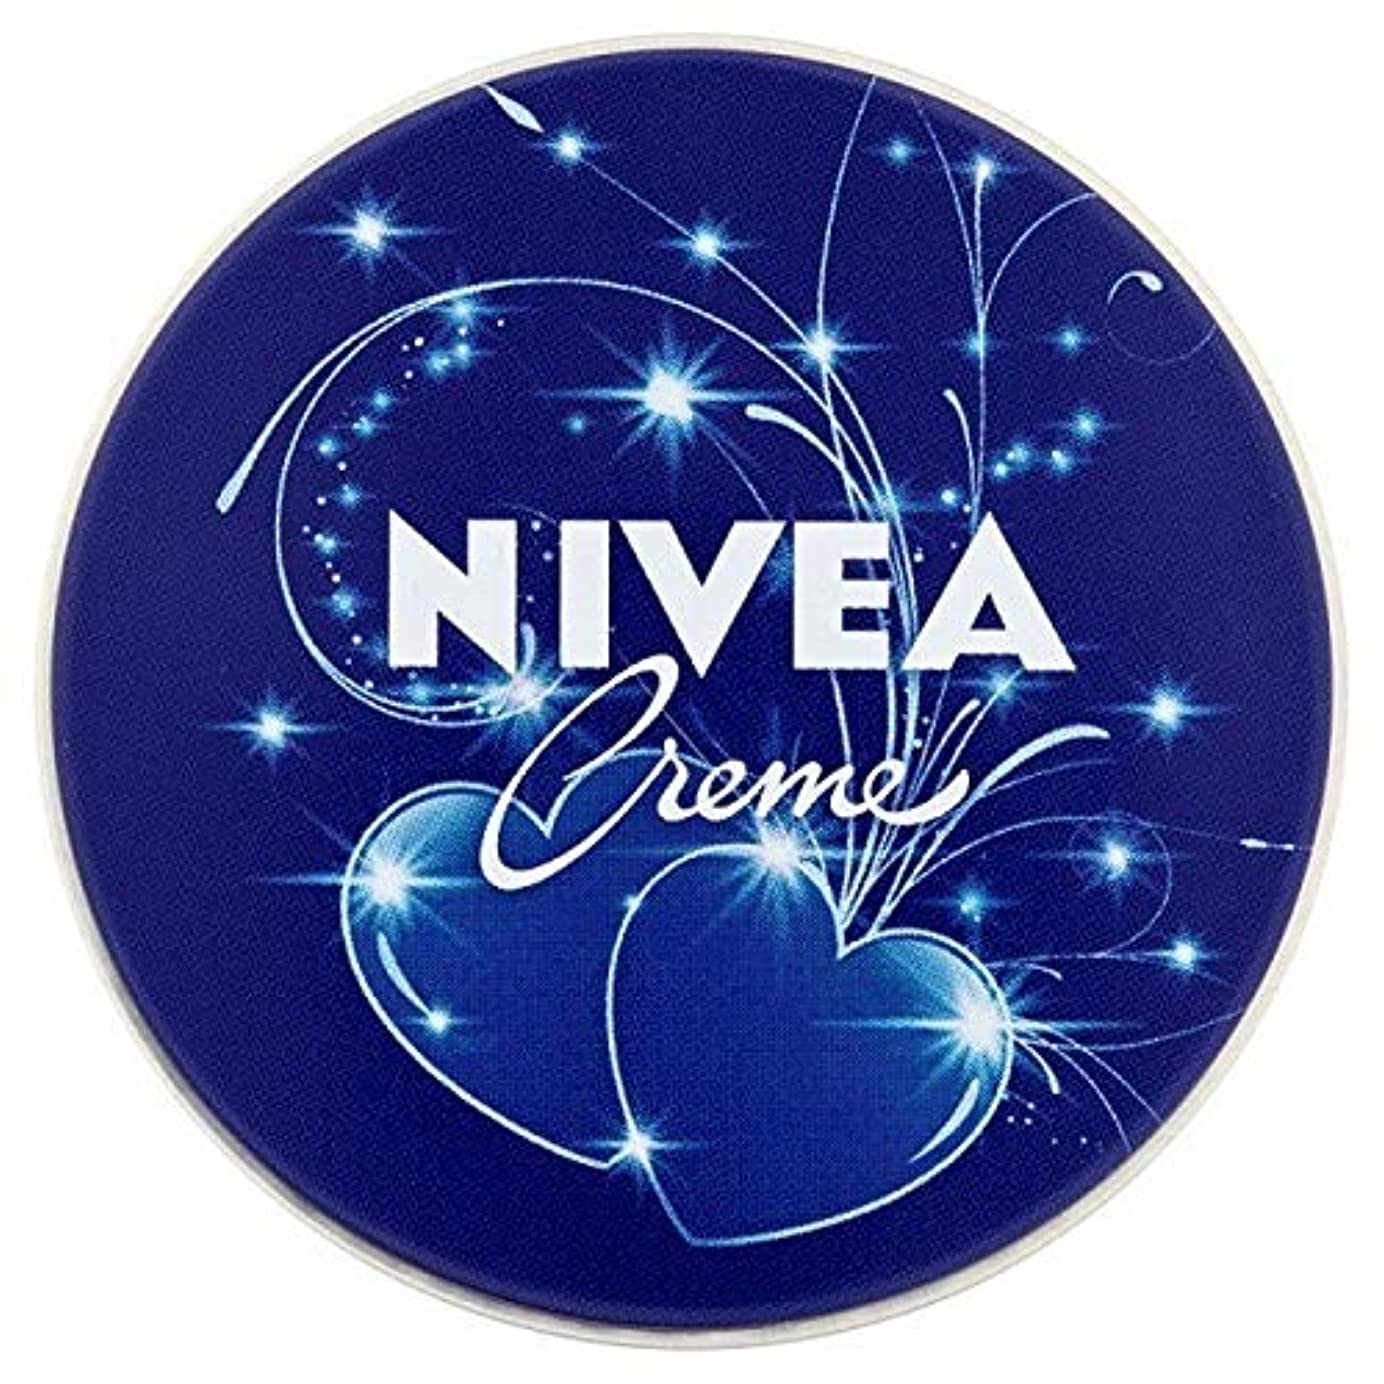 [Nivea ] ニベアクリーム錫30ミリリットル - Nivea Creme Tin 30ml [並行輸入品]